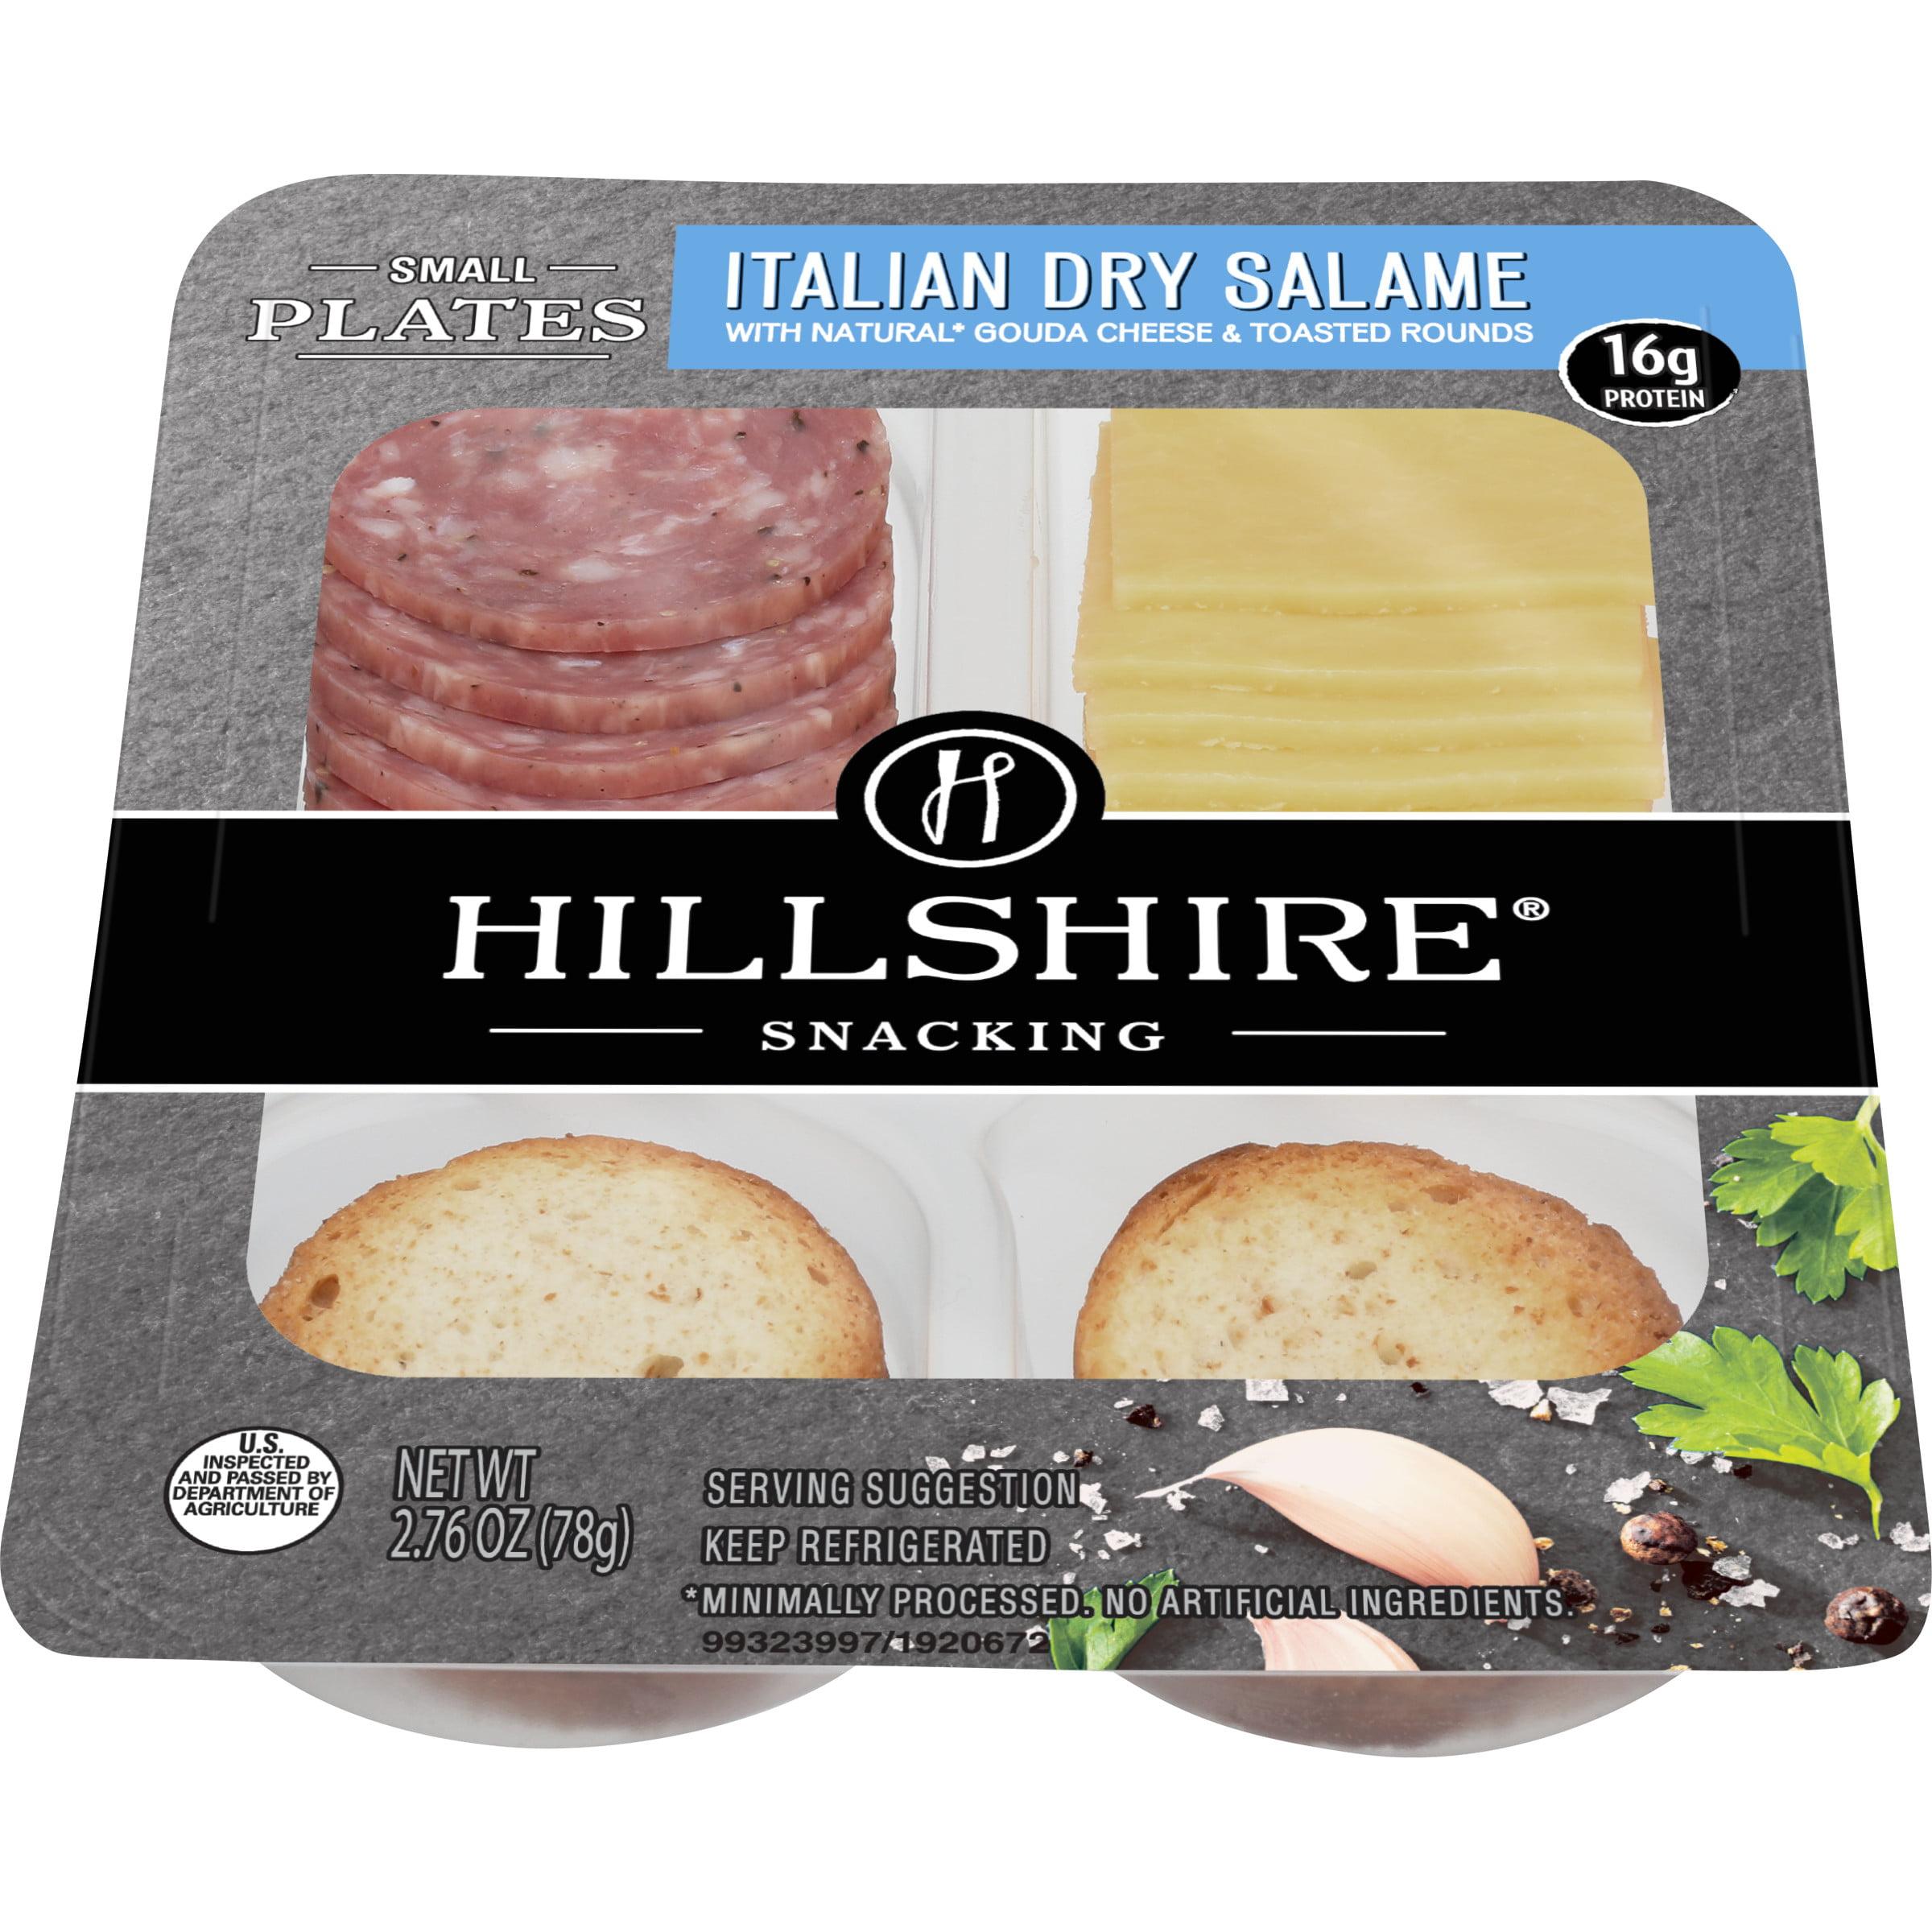 Hillshire Snacking Small Plates Italian Dry Salami Deli Lunch Meat And Gouda Cheese 2 76 Oz Walmart Com Walmart Com